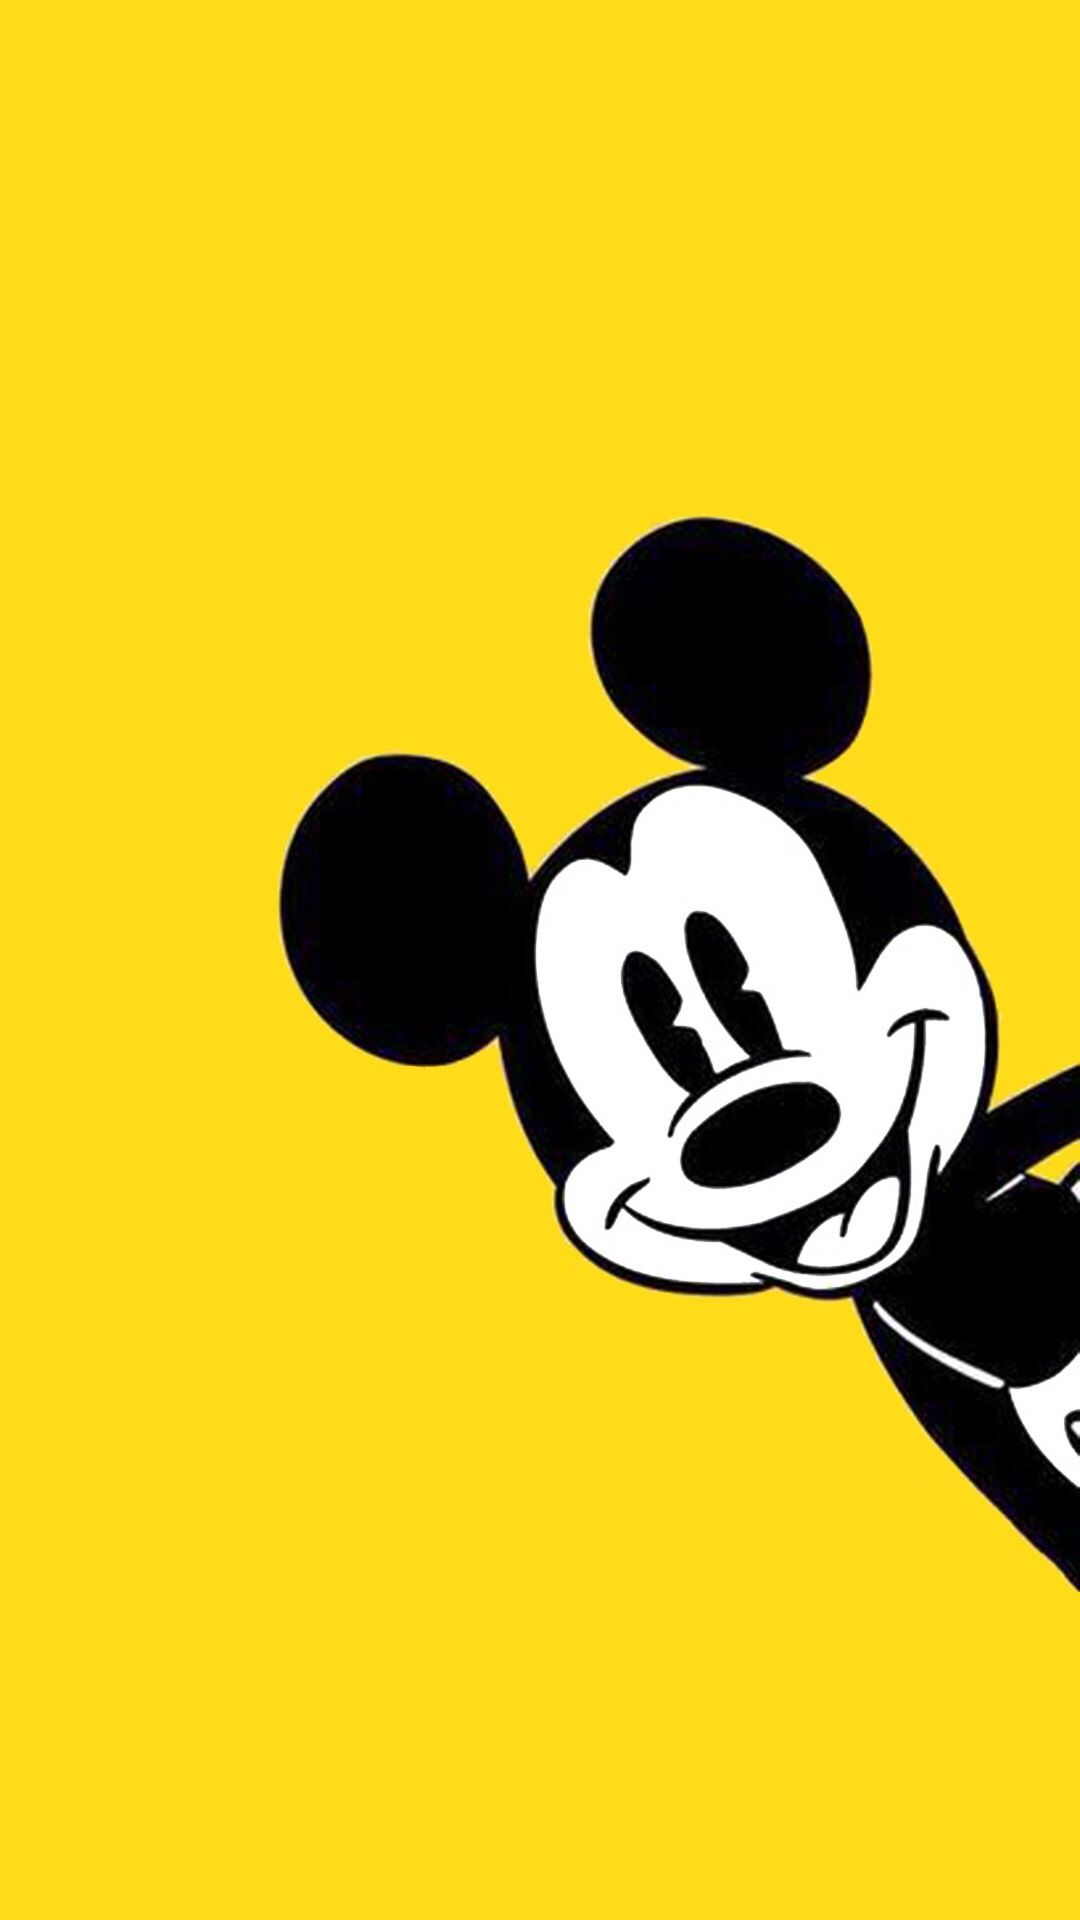 Great Wallpaper Home Screen Mickey Mouse - 52195c031c78c7f9643be9516e60e7de  Image_463961.jpg